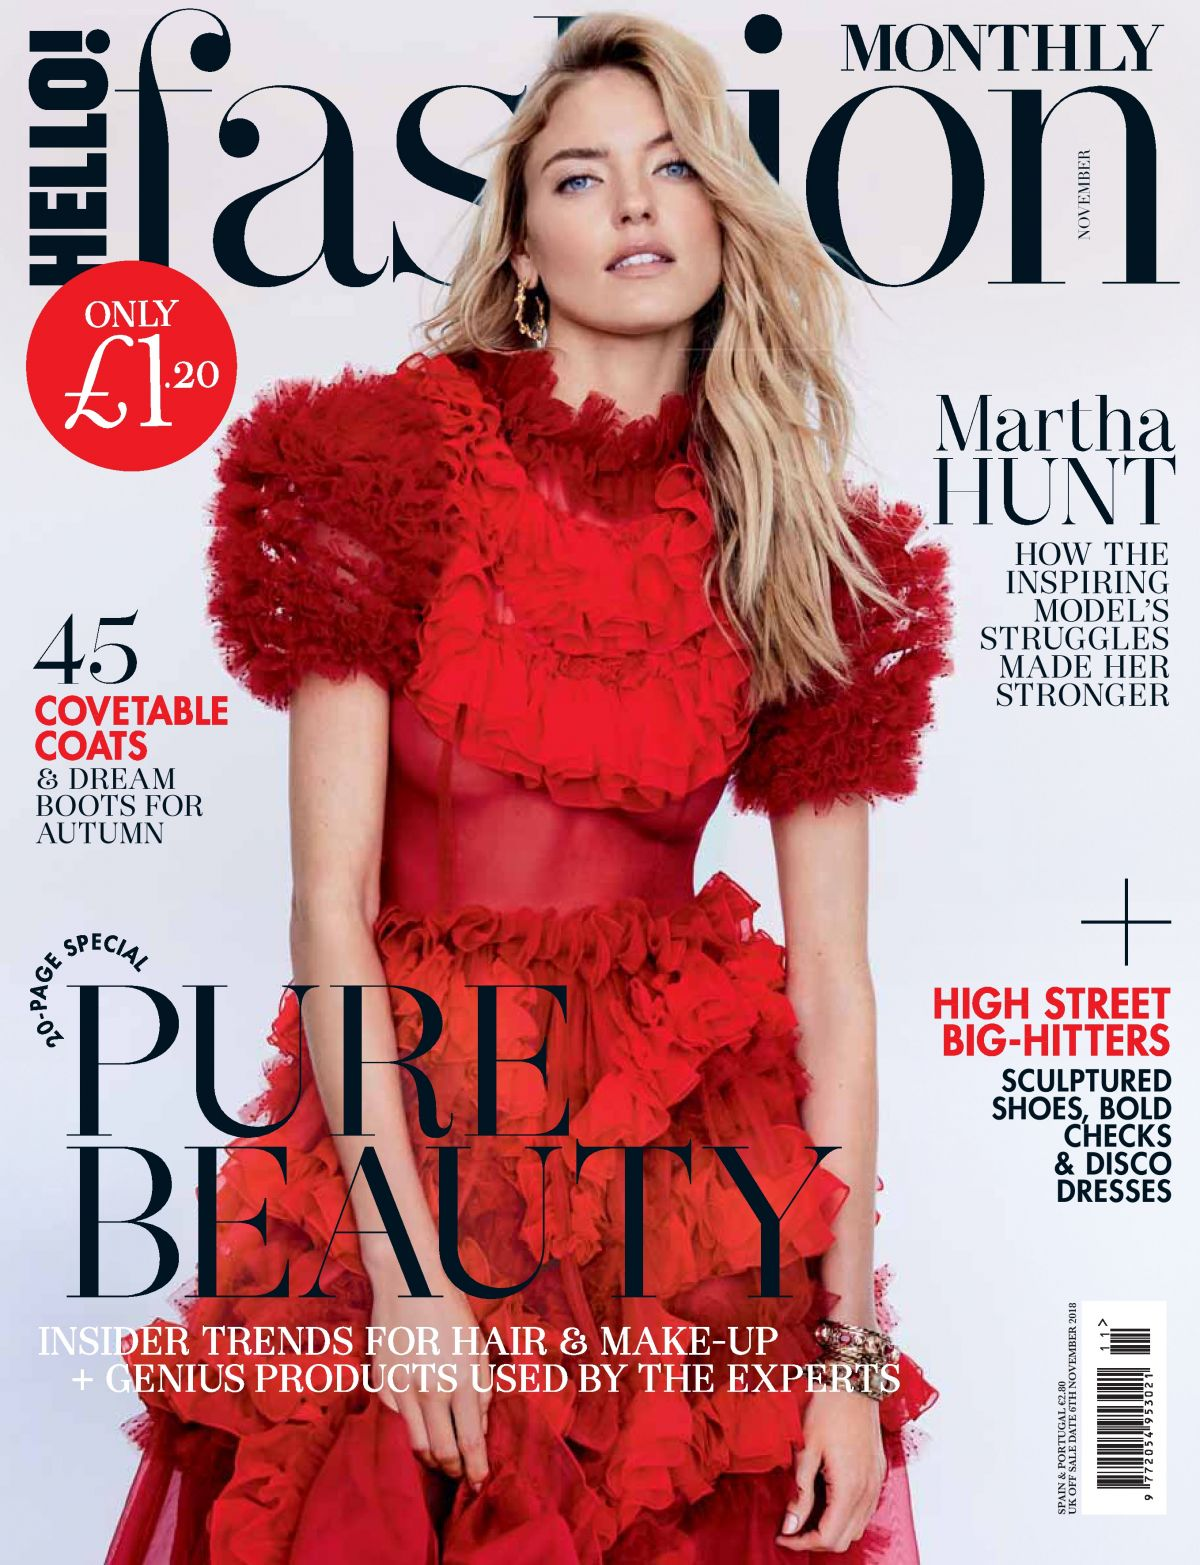 martha-hunt-in-hello-fashion-monthly-magazine-november-2018-6.jpg